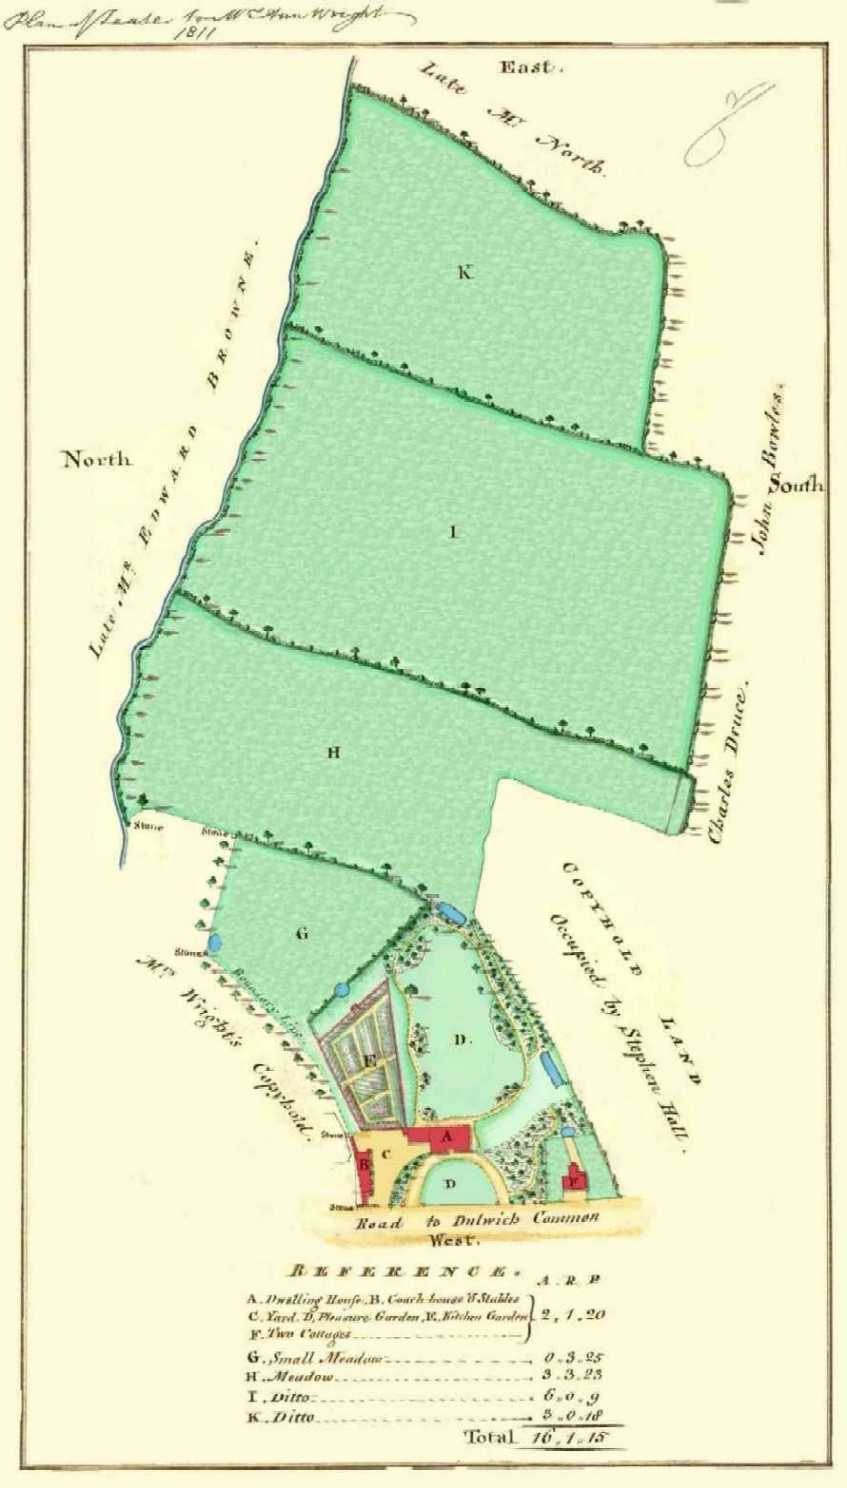 Bell House garden and farm 1811